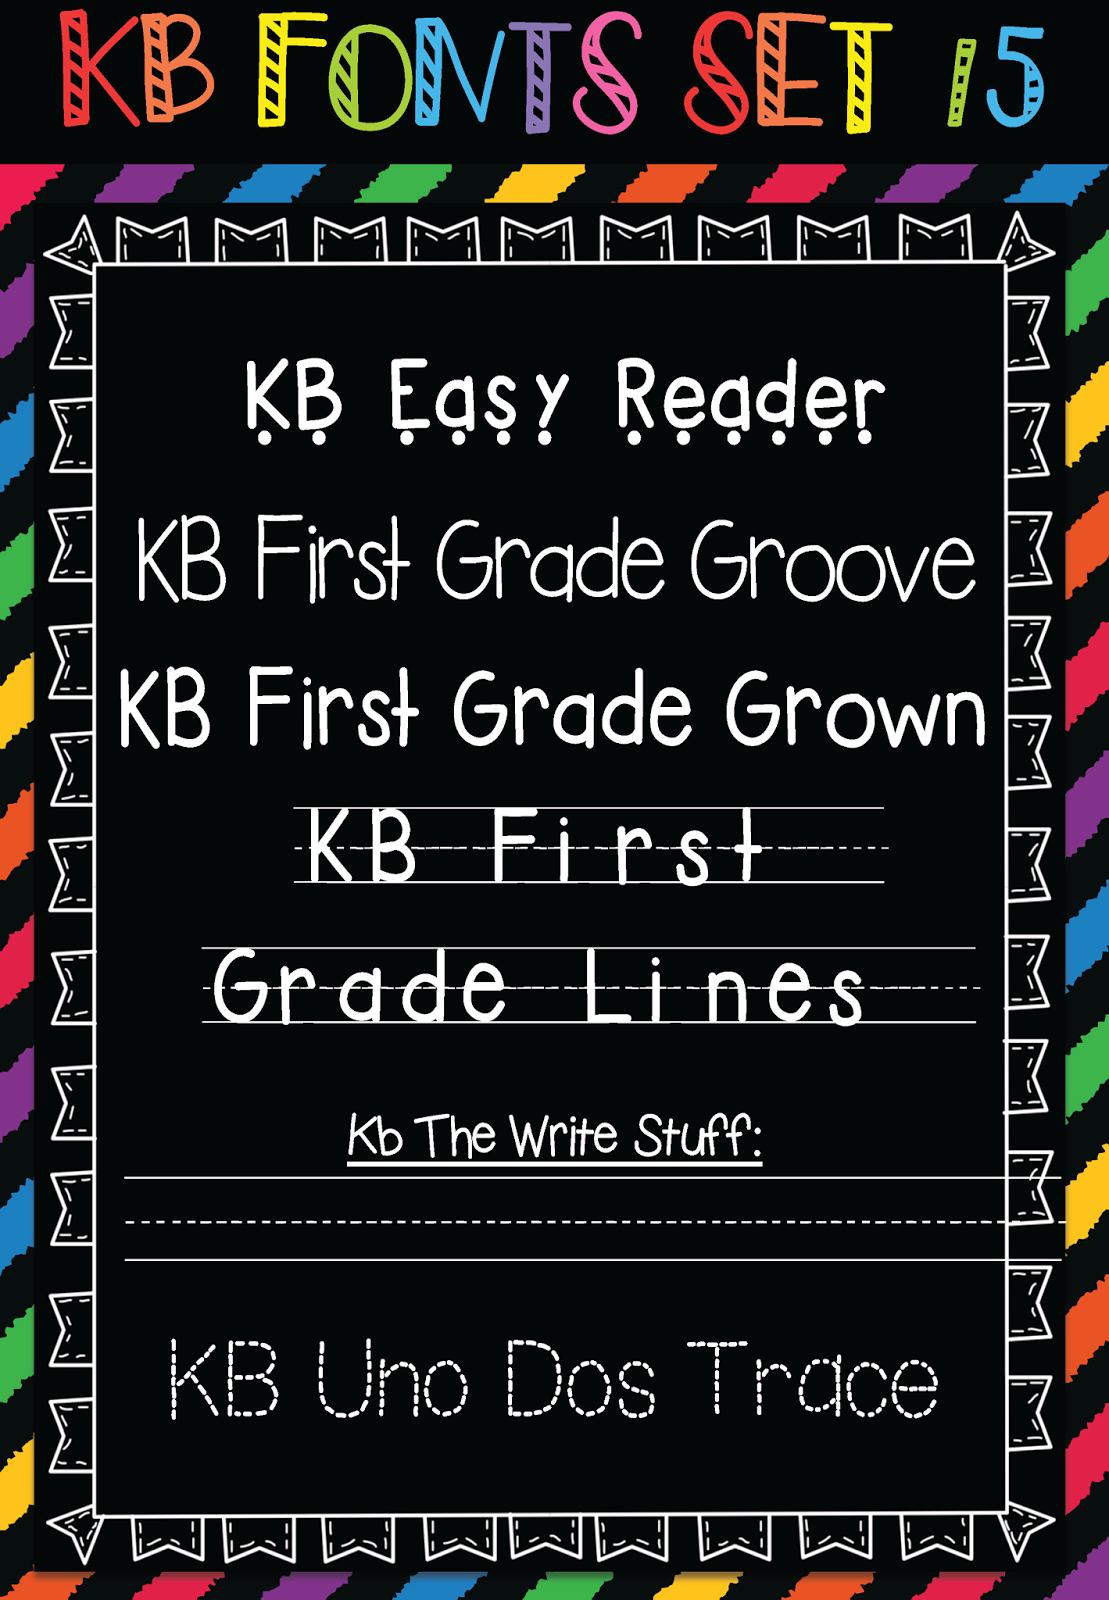 Download Keepin' It Kool In KinderLand: Font Frenzy - Big Font ...